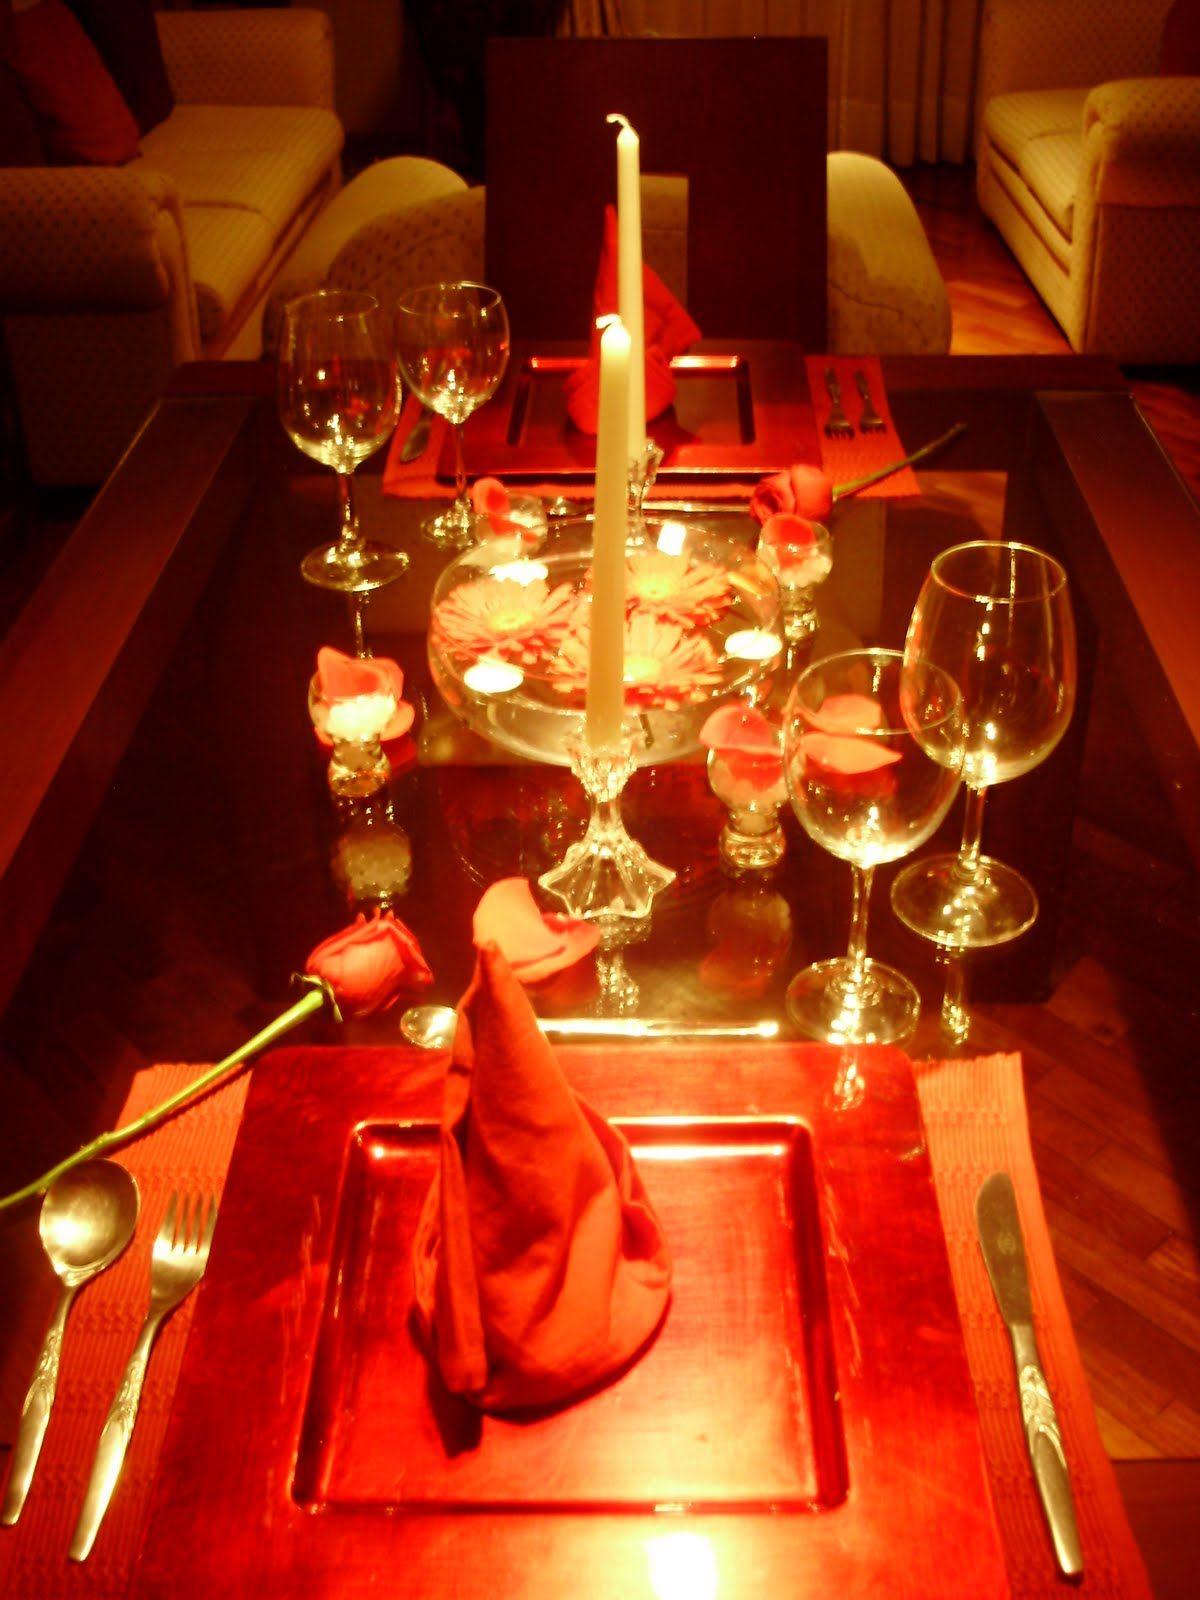 Decoracion Para Una Noche Romantica Gadgets Kitchen Cooking Romantic Dinners Romantic Glasses